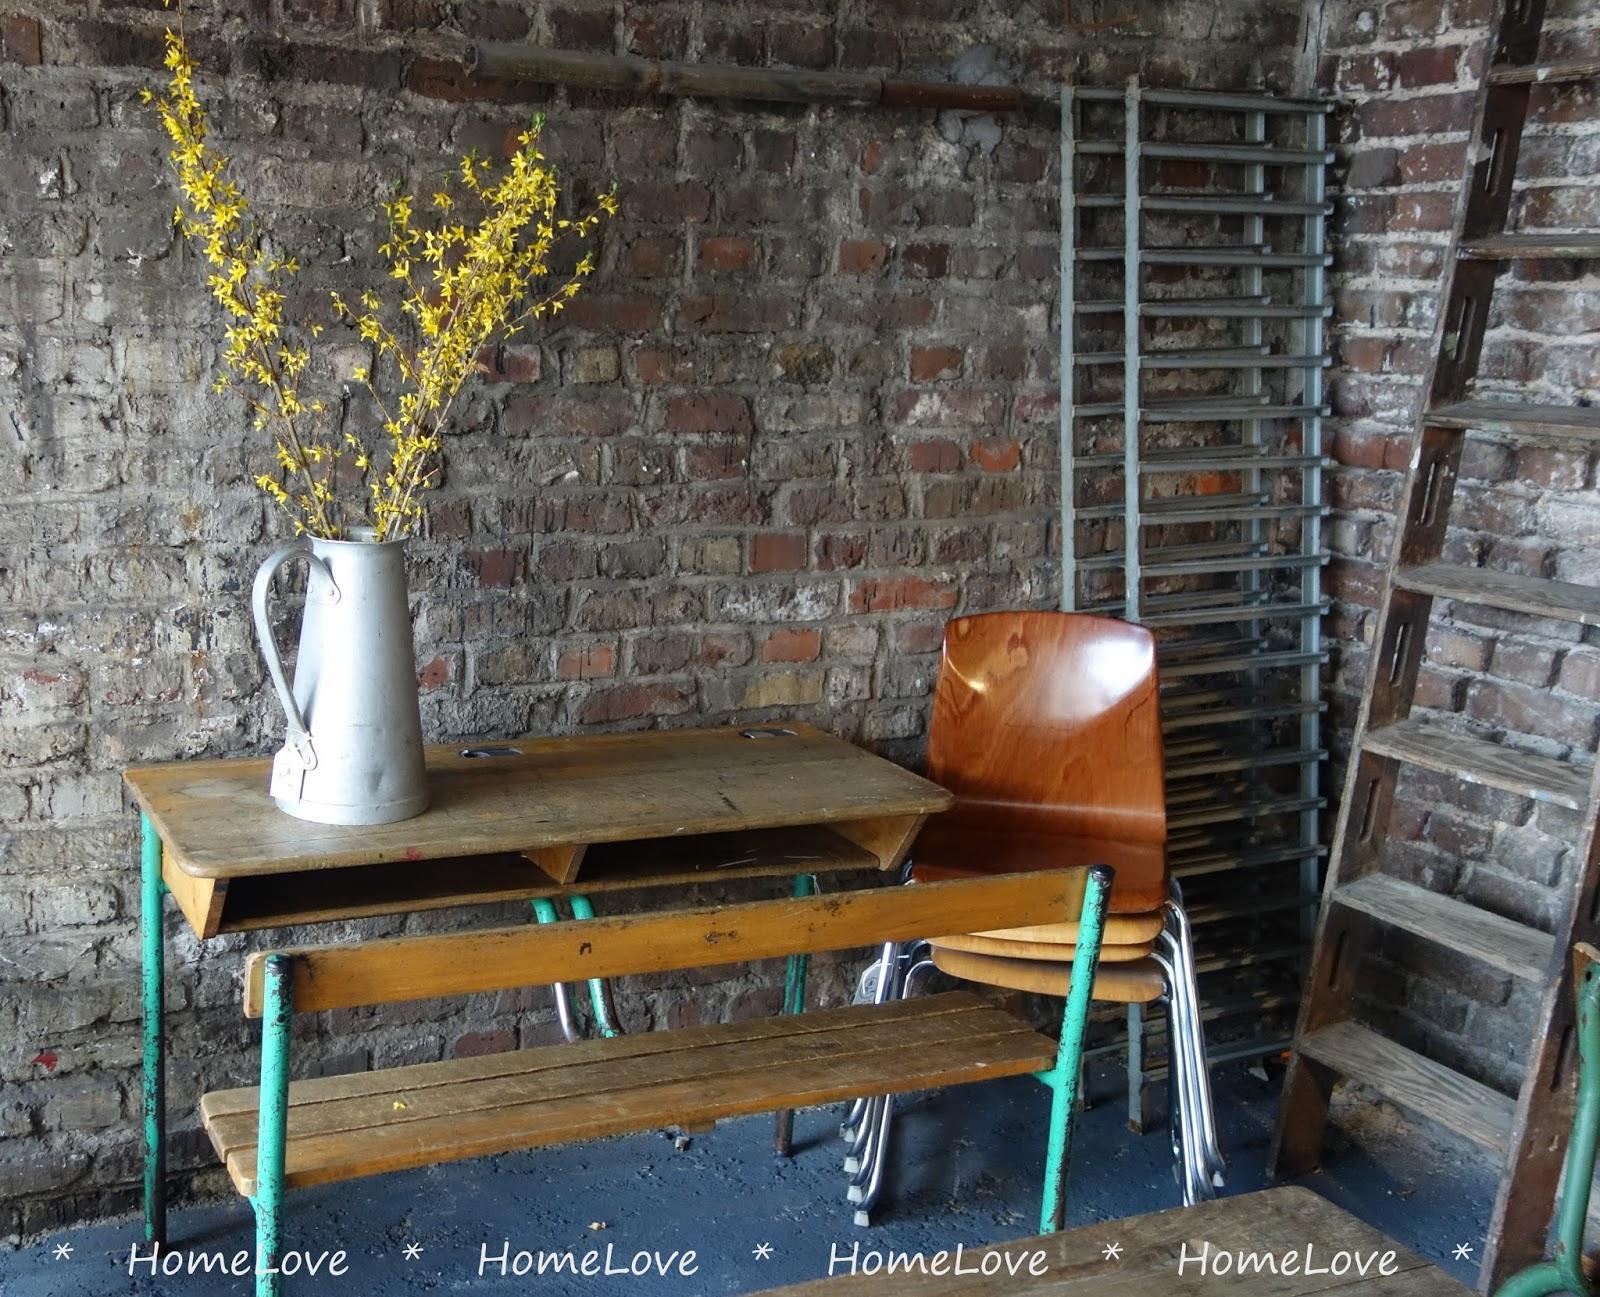 HomeLove: Waage Vier Intérieur - Vintage Möbel